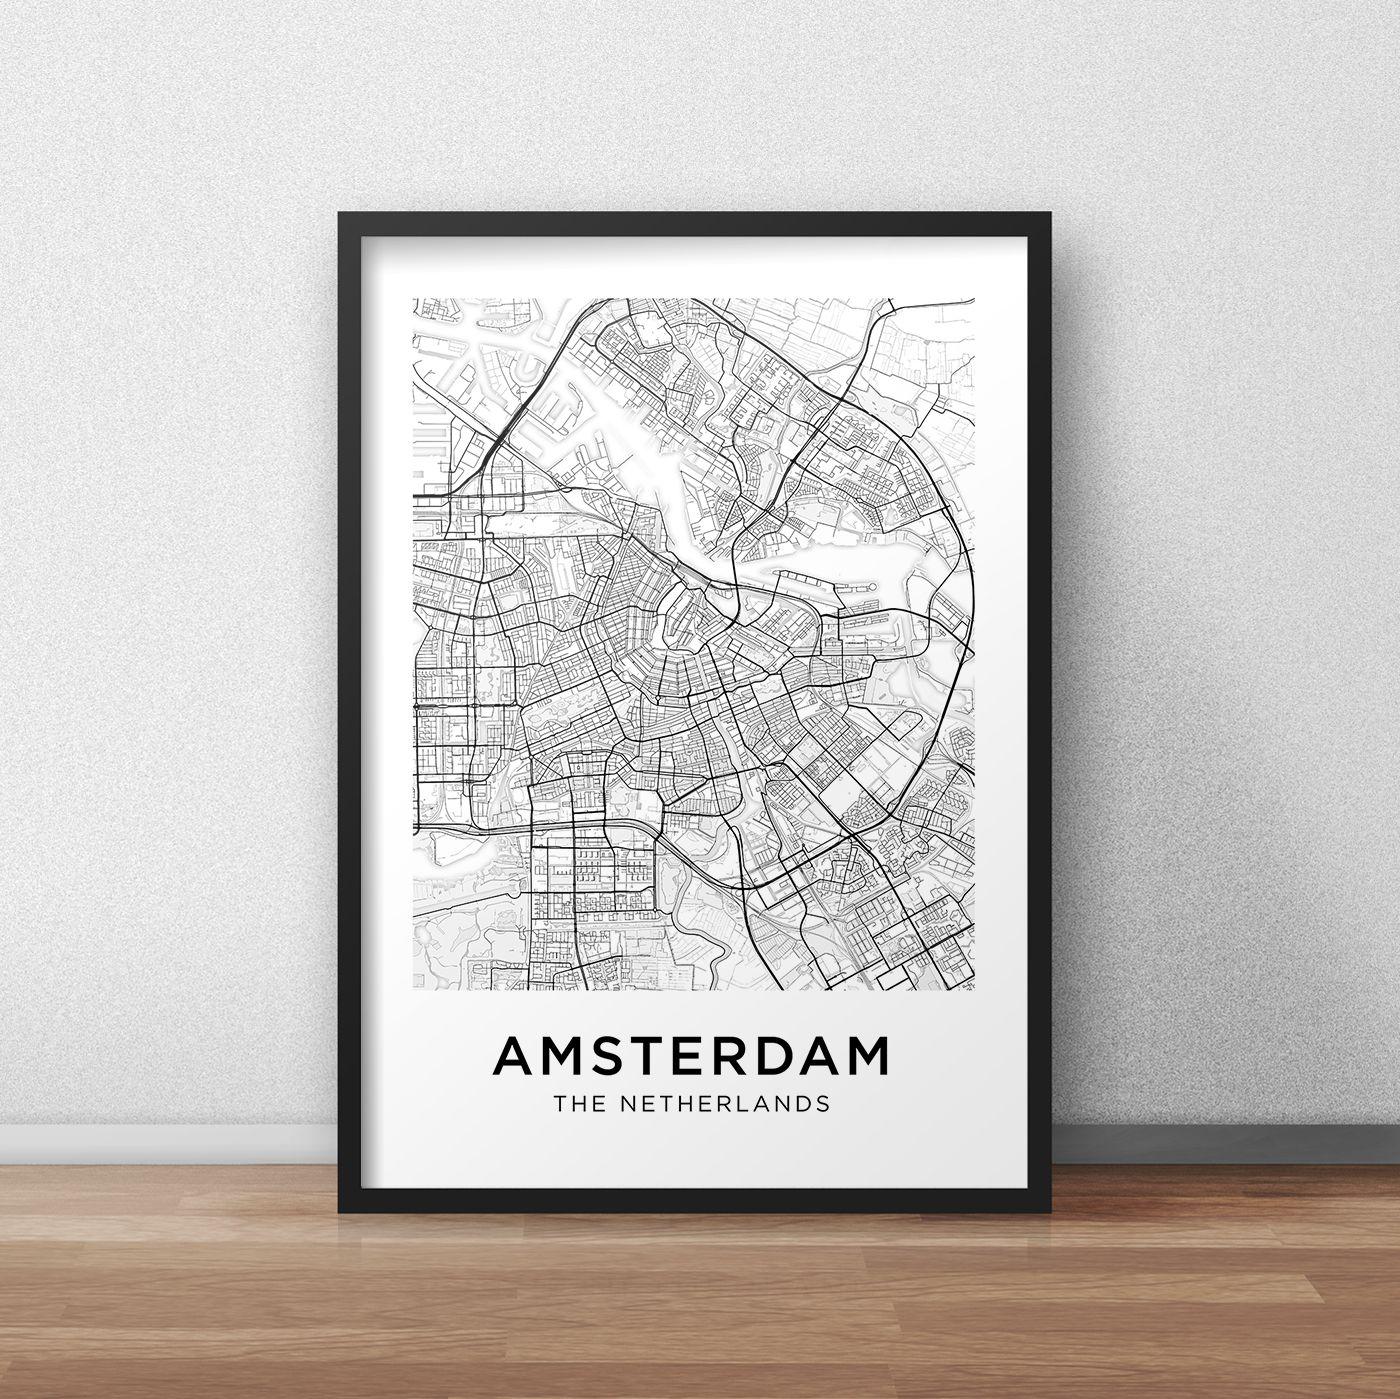 Amsterdam Map Print Printable Amsterdam Map Amsterdam City Map Amsterdam Street Map Amsterdam Poster Wall Art Black And Amsterdam Map Map Print Wall Maps